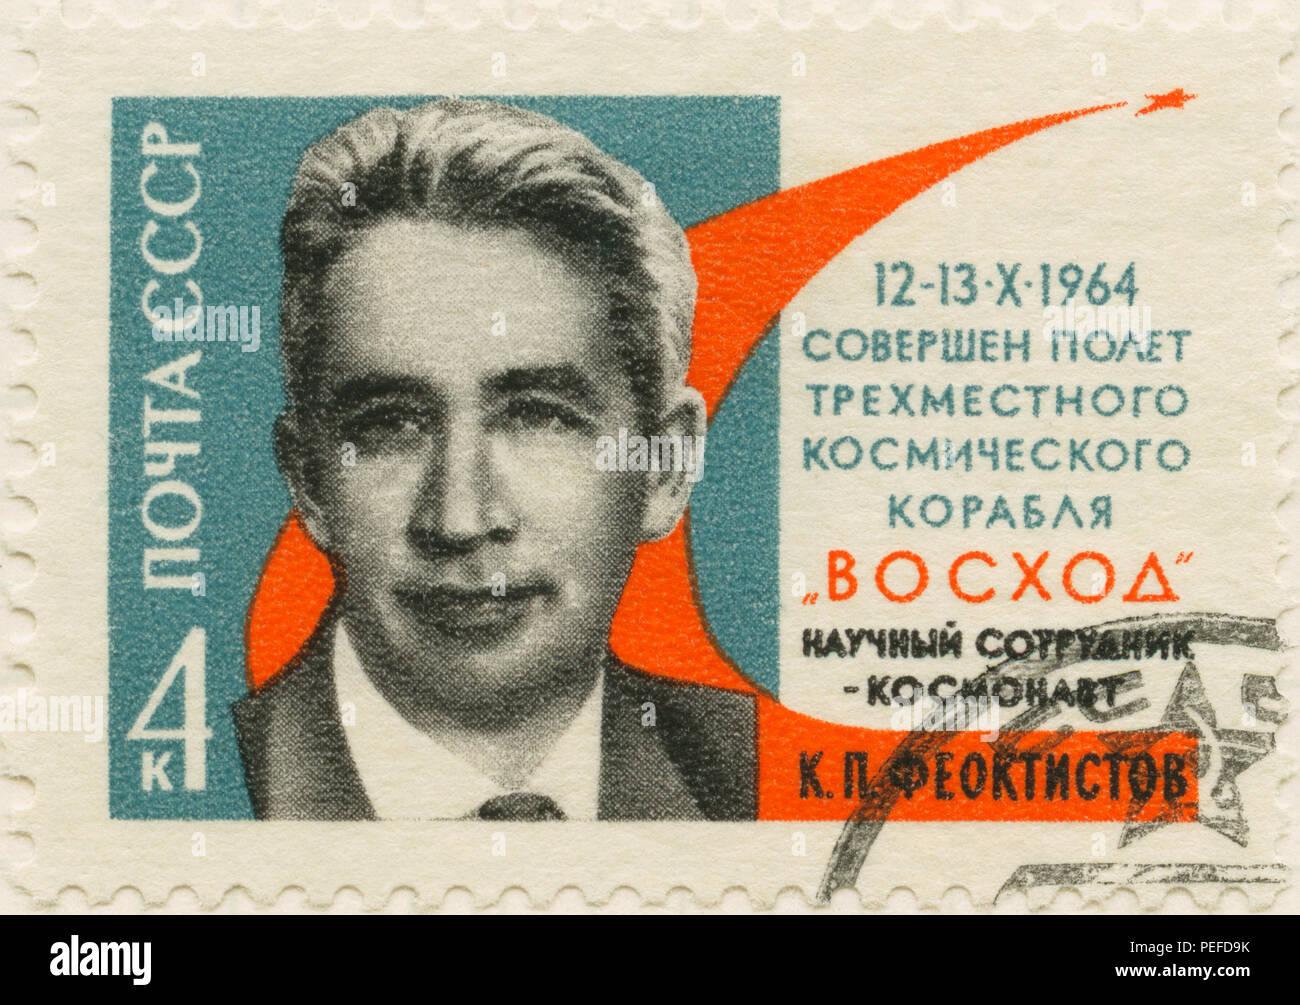 Konstantin Petrovich Feoktistov(1926–2009) SovietCosmonautand Eminent SpaceEngineer, Commemorative Postage Stamp, Soviet Union, 1964 - Stock Image